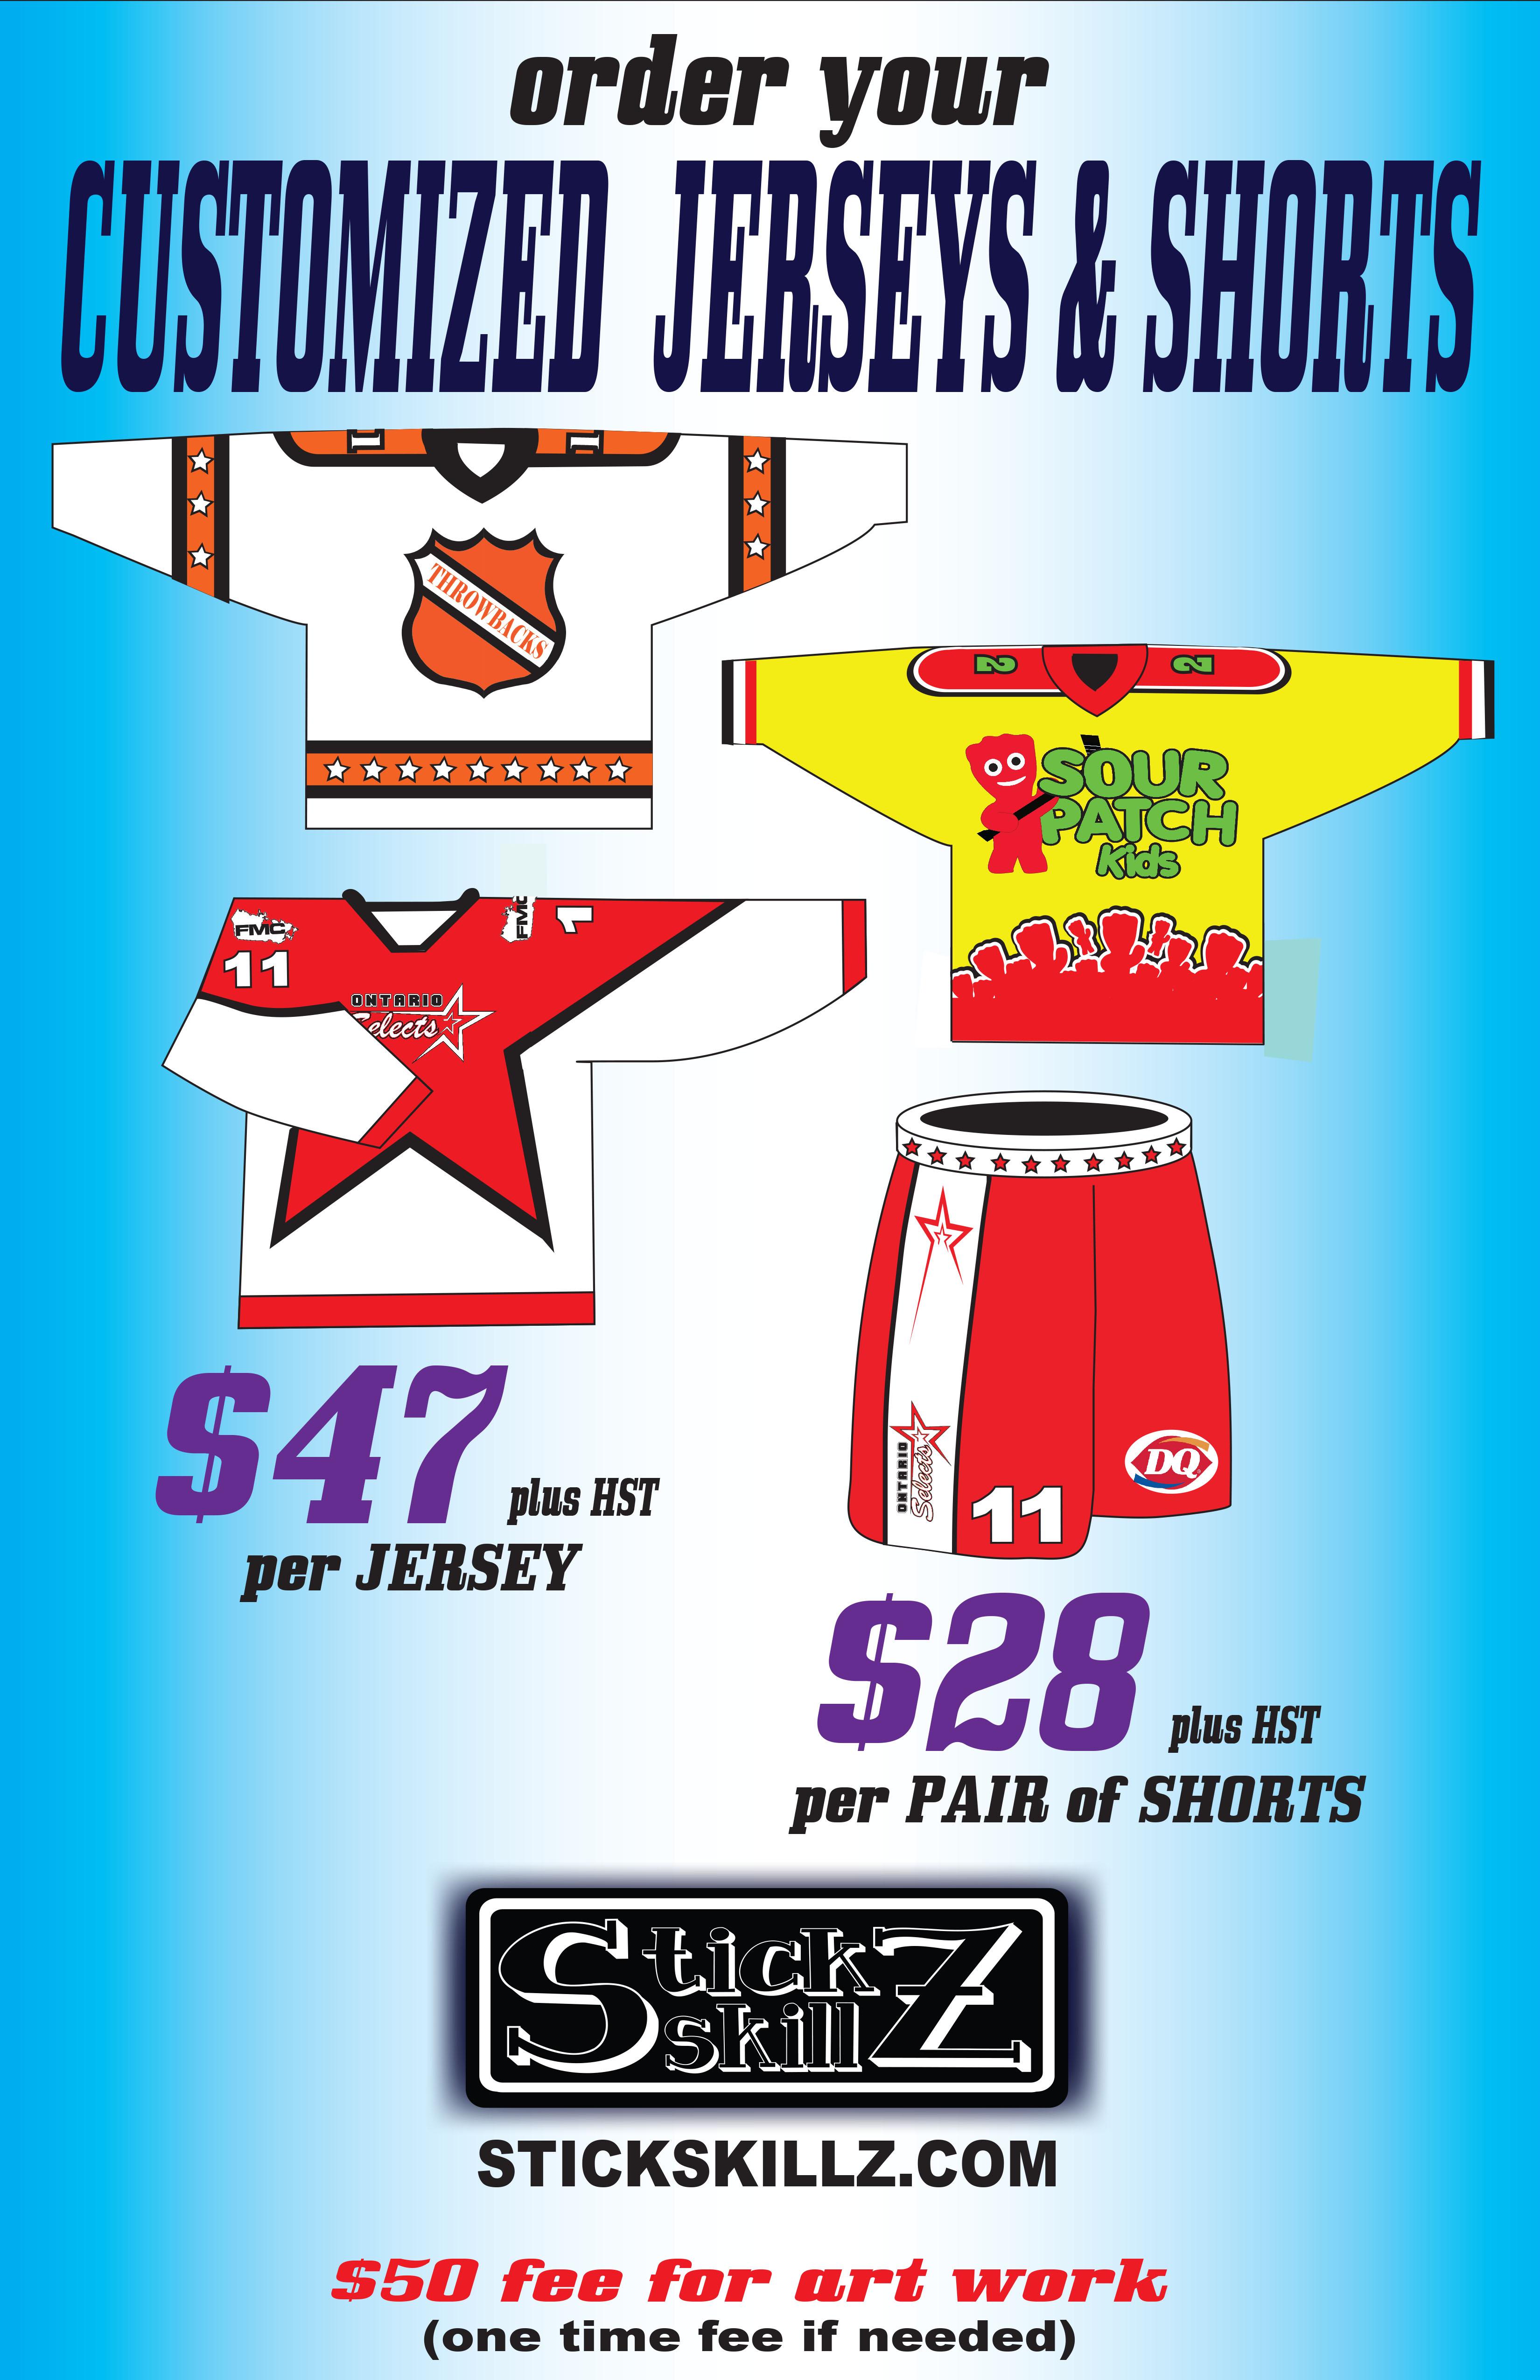 Customized Jerseys Poster